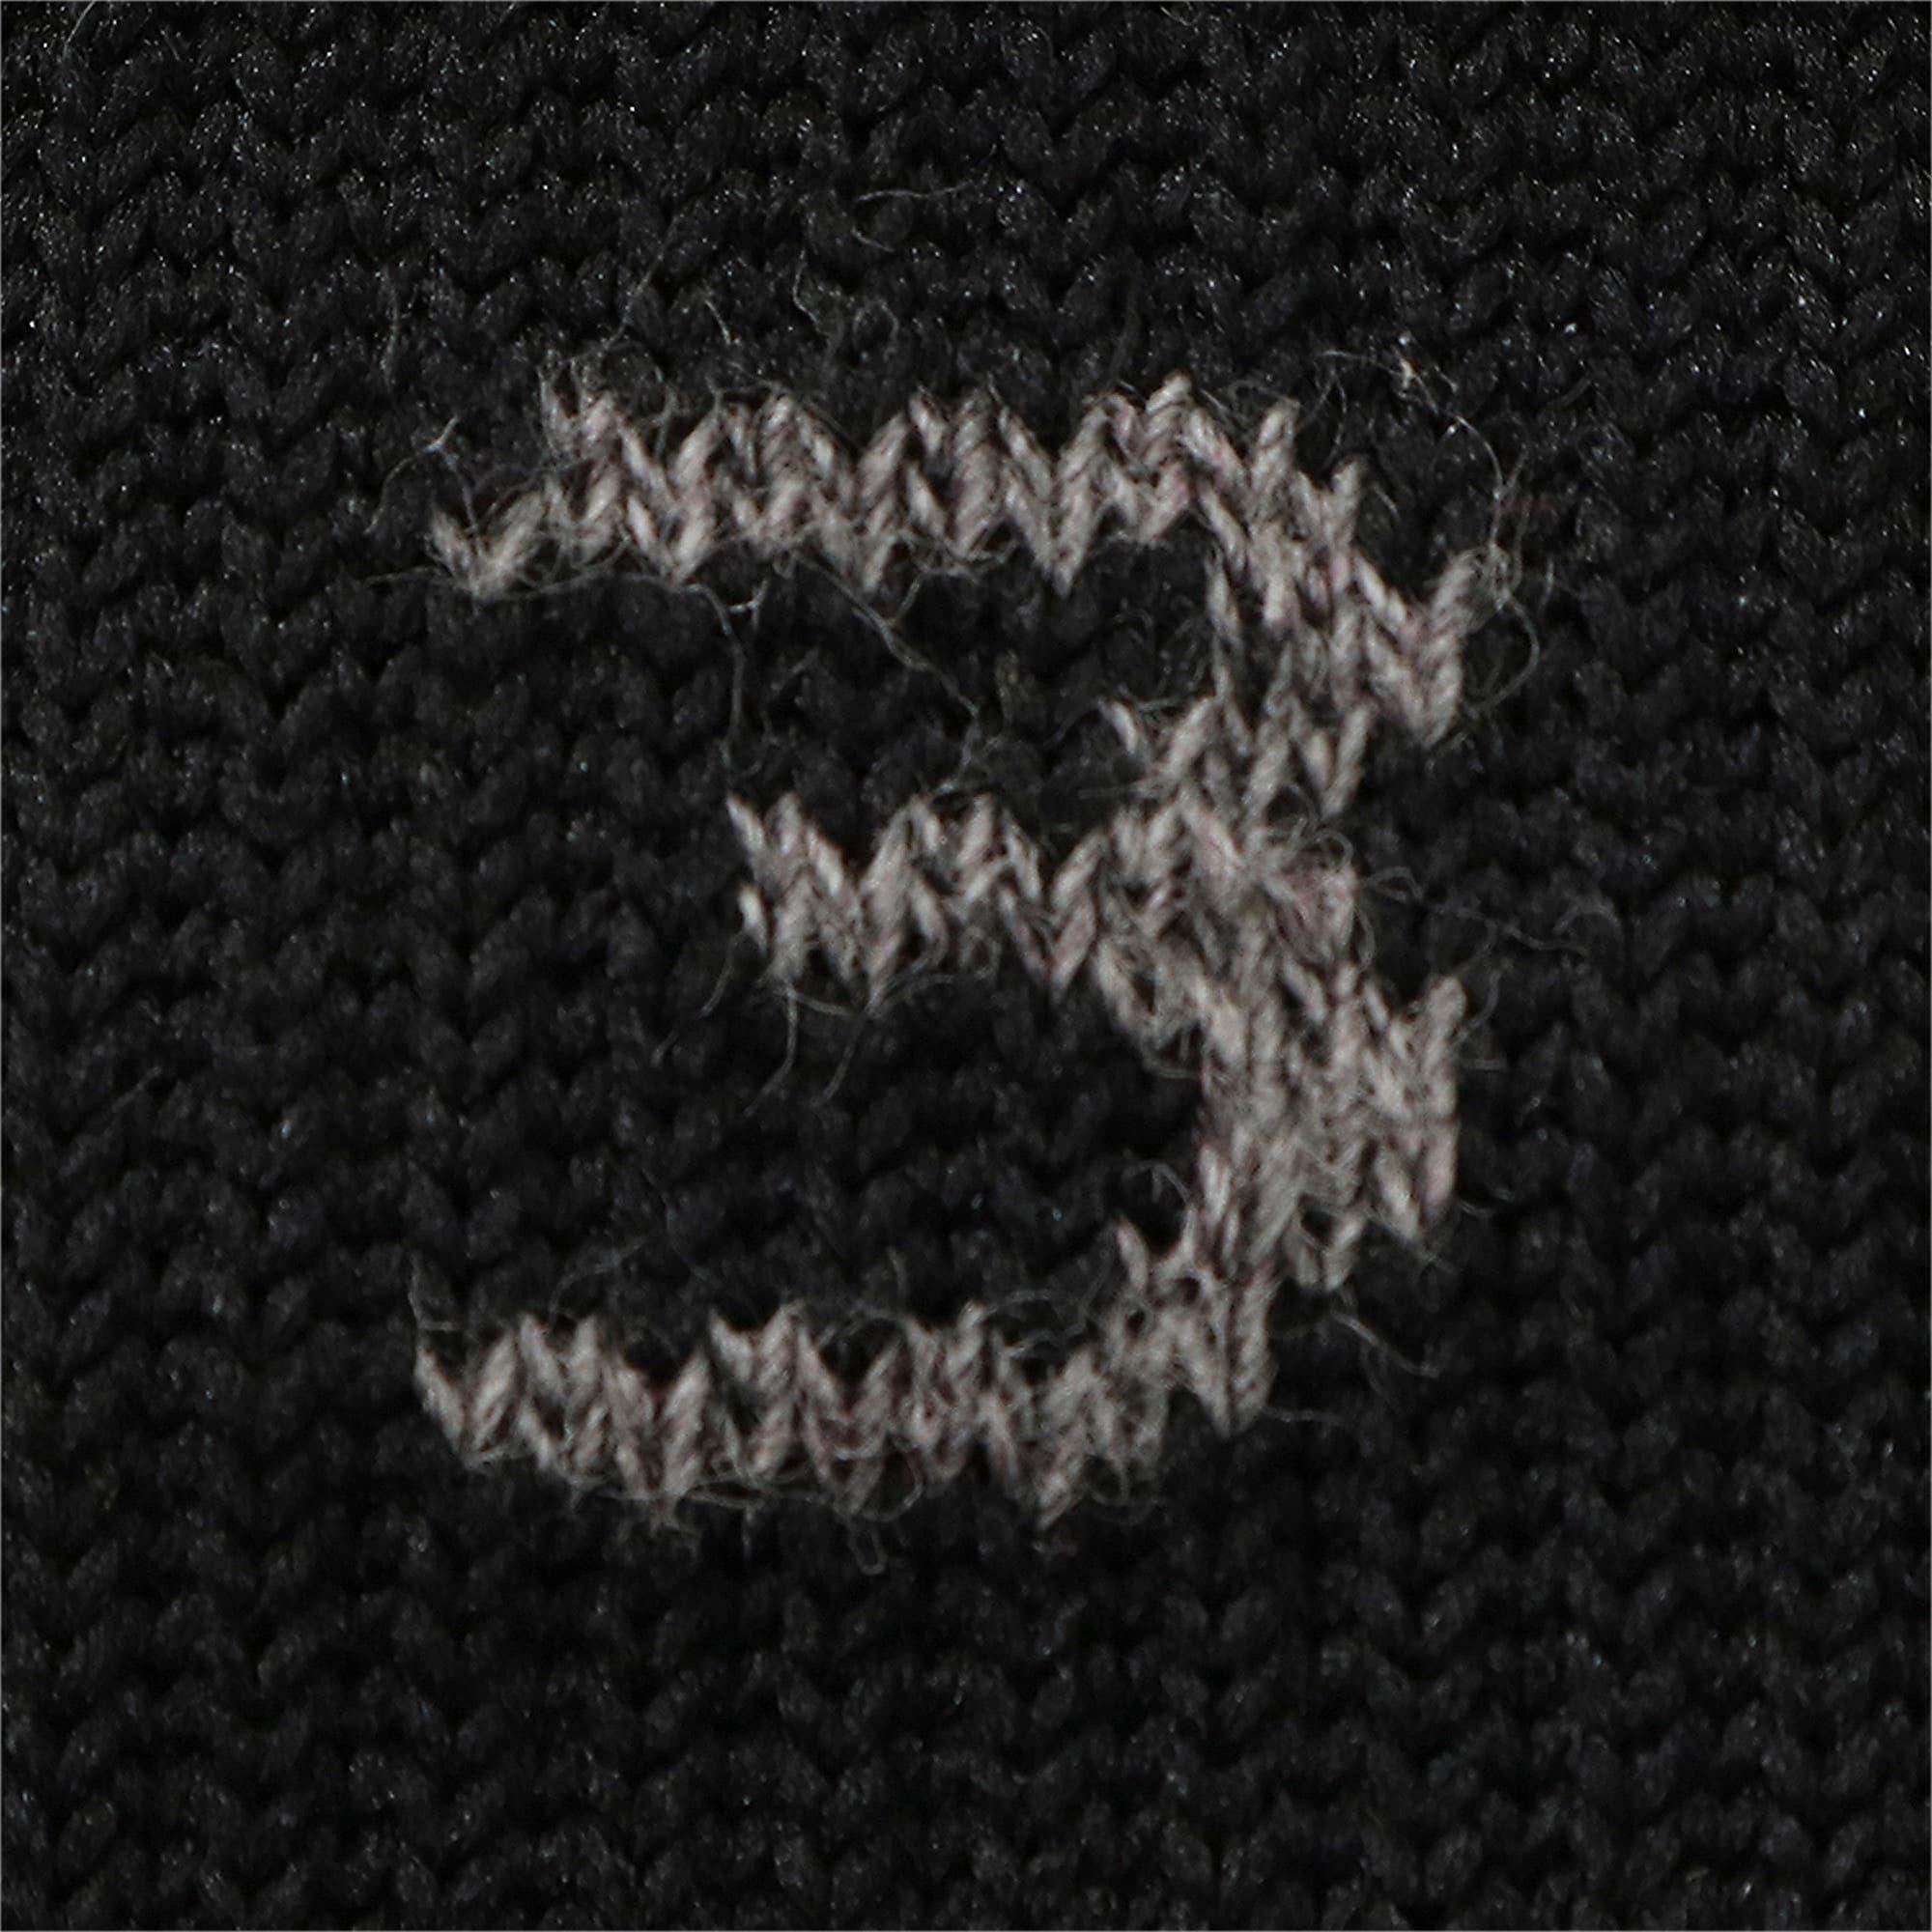 Thumbnail 8 of ACミラン ACM バンド ストッキング, Puma Black-Tango Red, medium-JPN